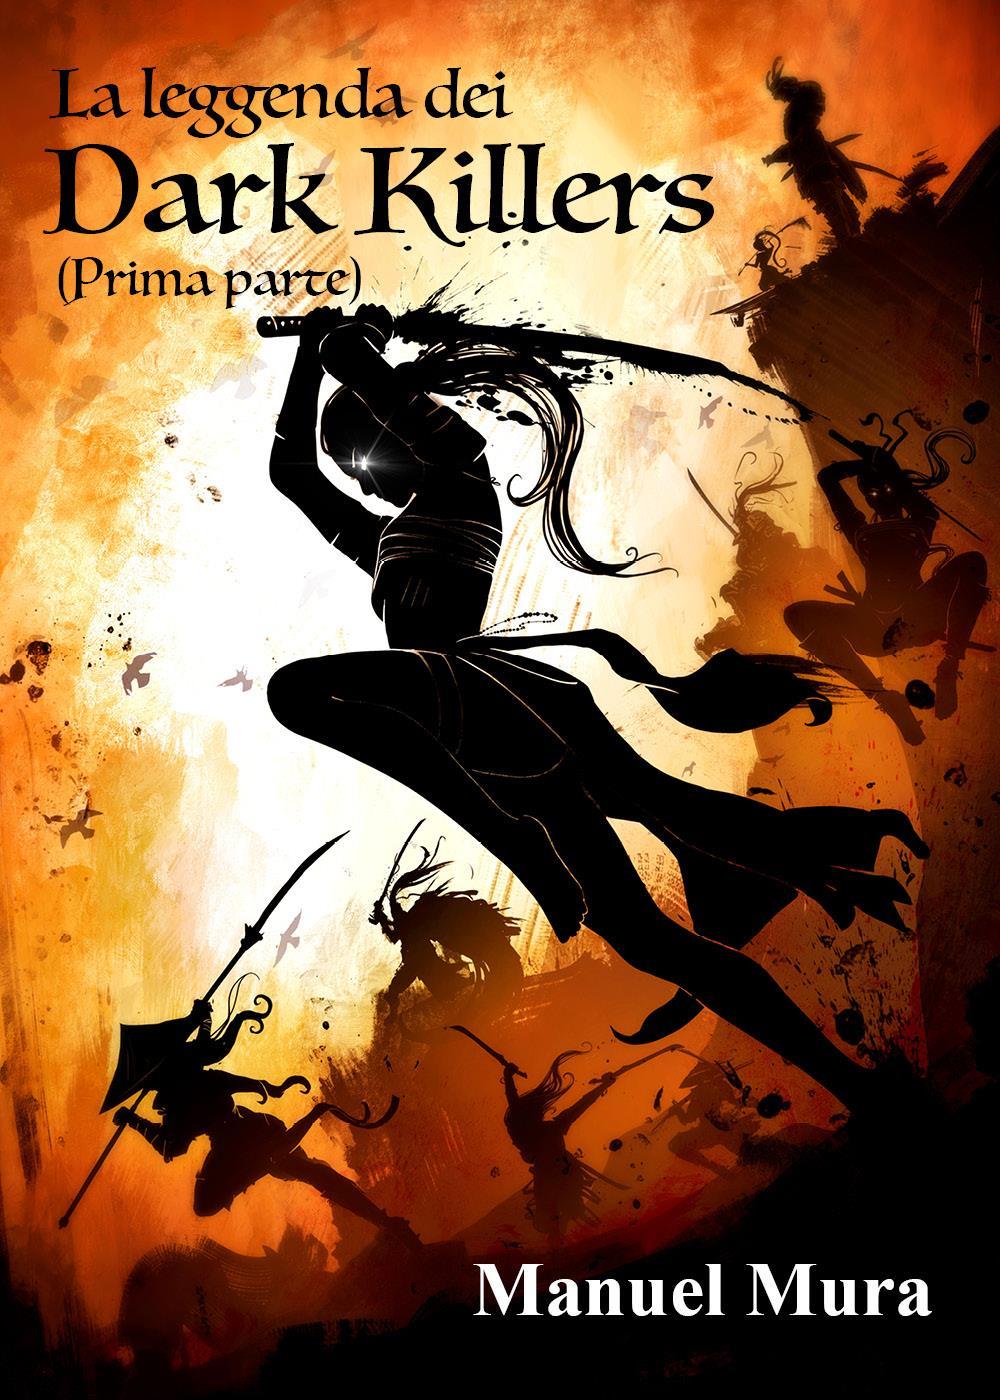 La leggenda dei Dark Killers (prima parte)